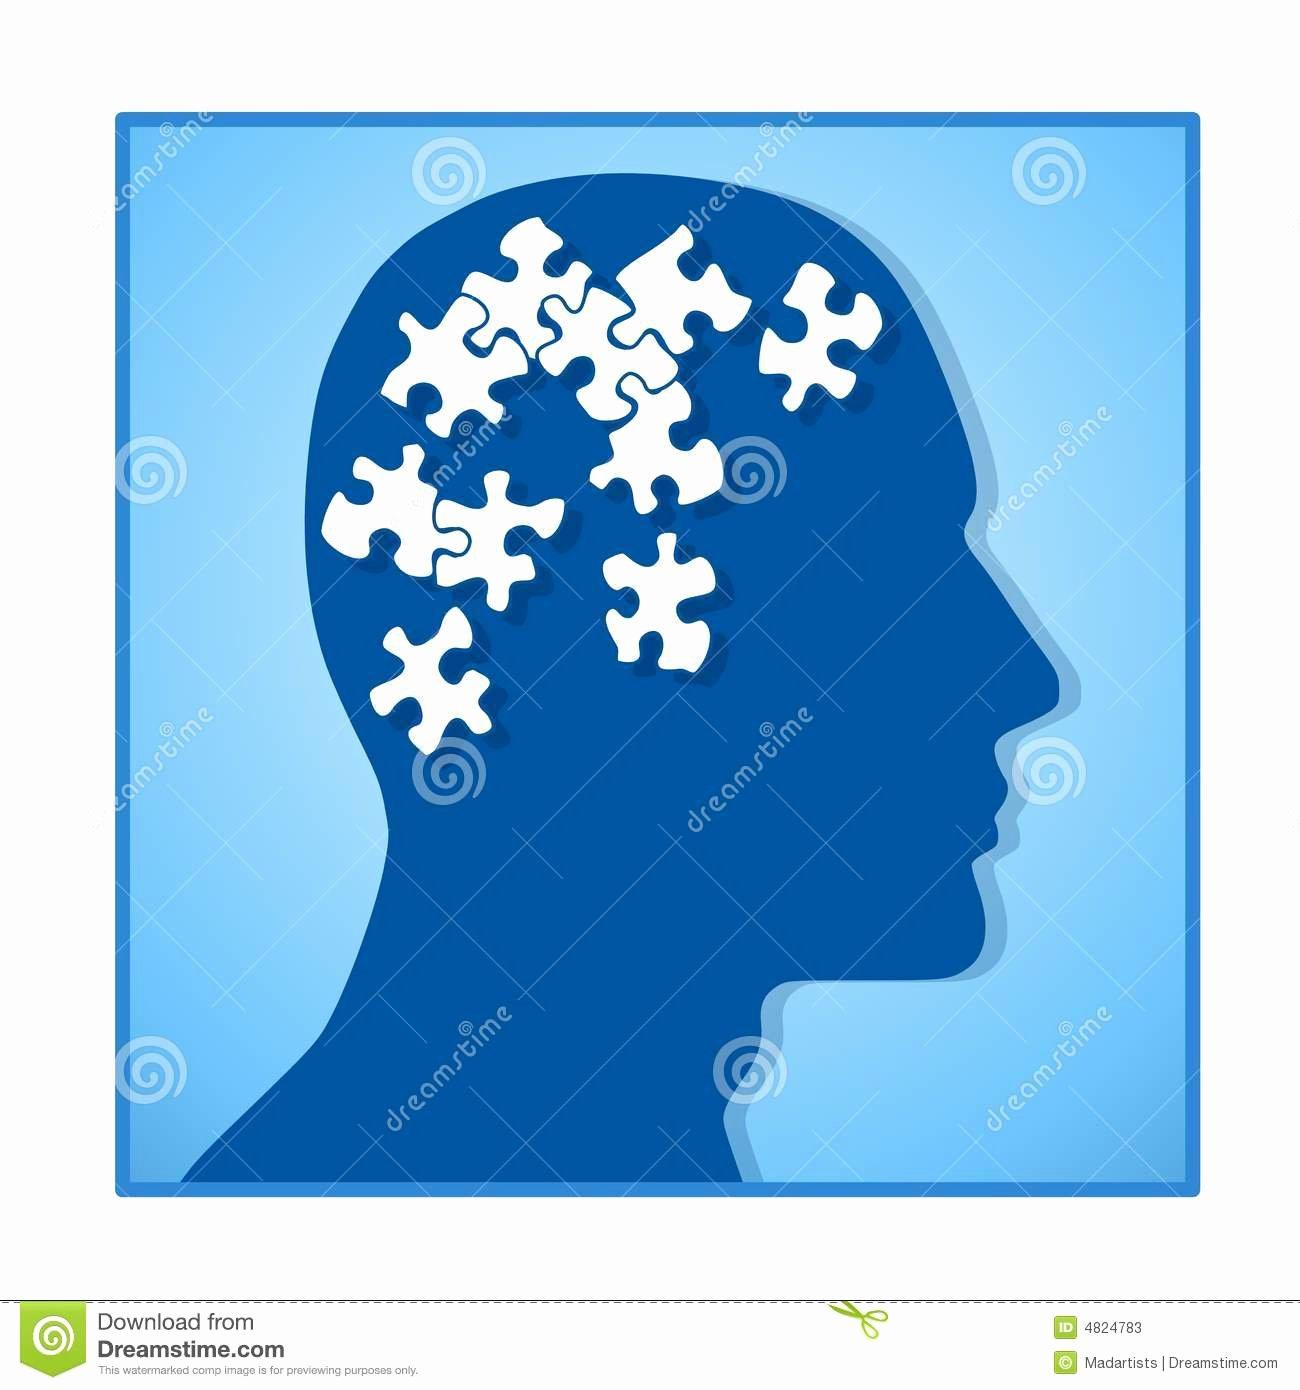 Nature Vs Nurture Venn Diagram New Brain as Puzzle Pieces In Head Stock S Image